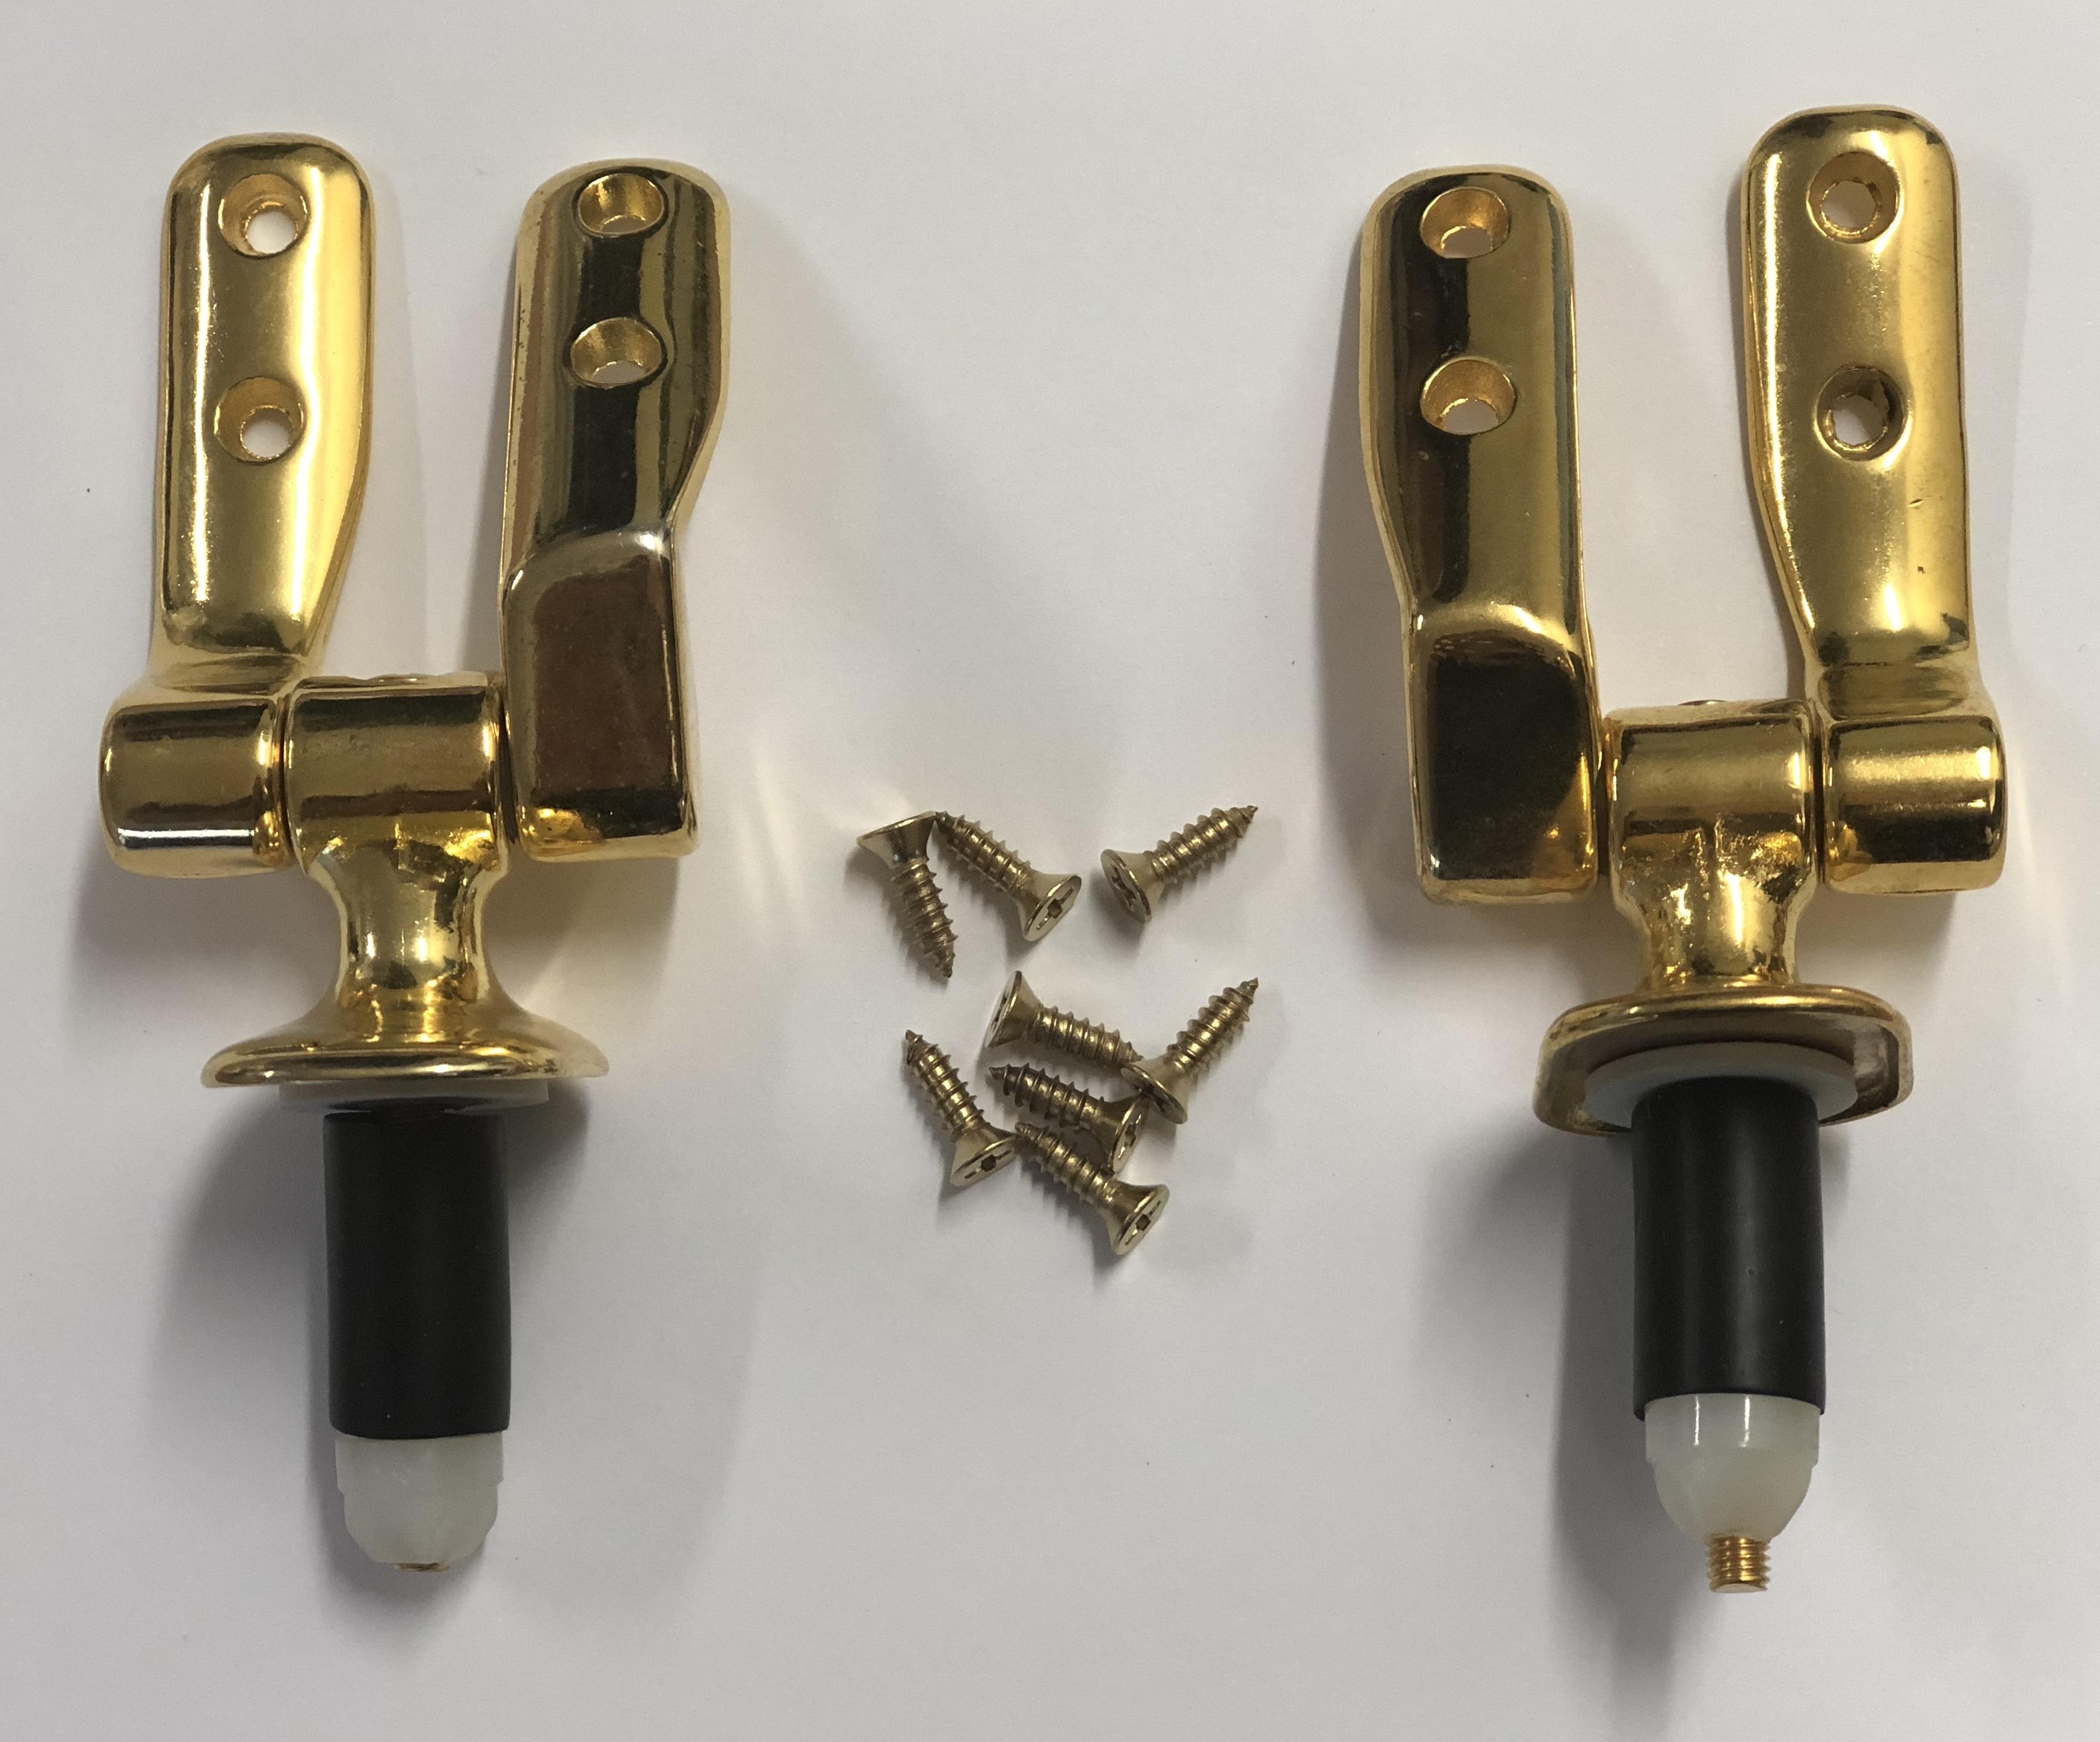 Kohler Calypso Seat Hinges Gold Hygrade Plumbing